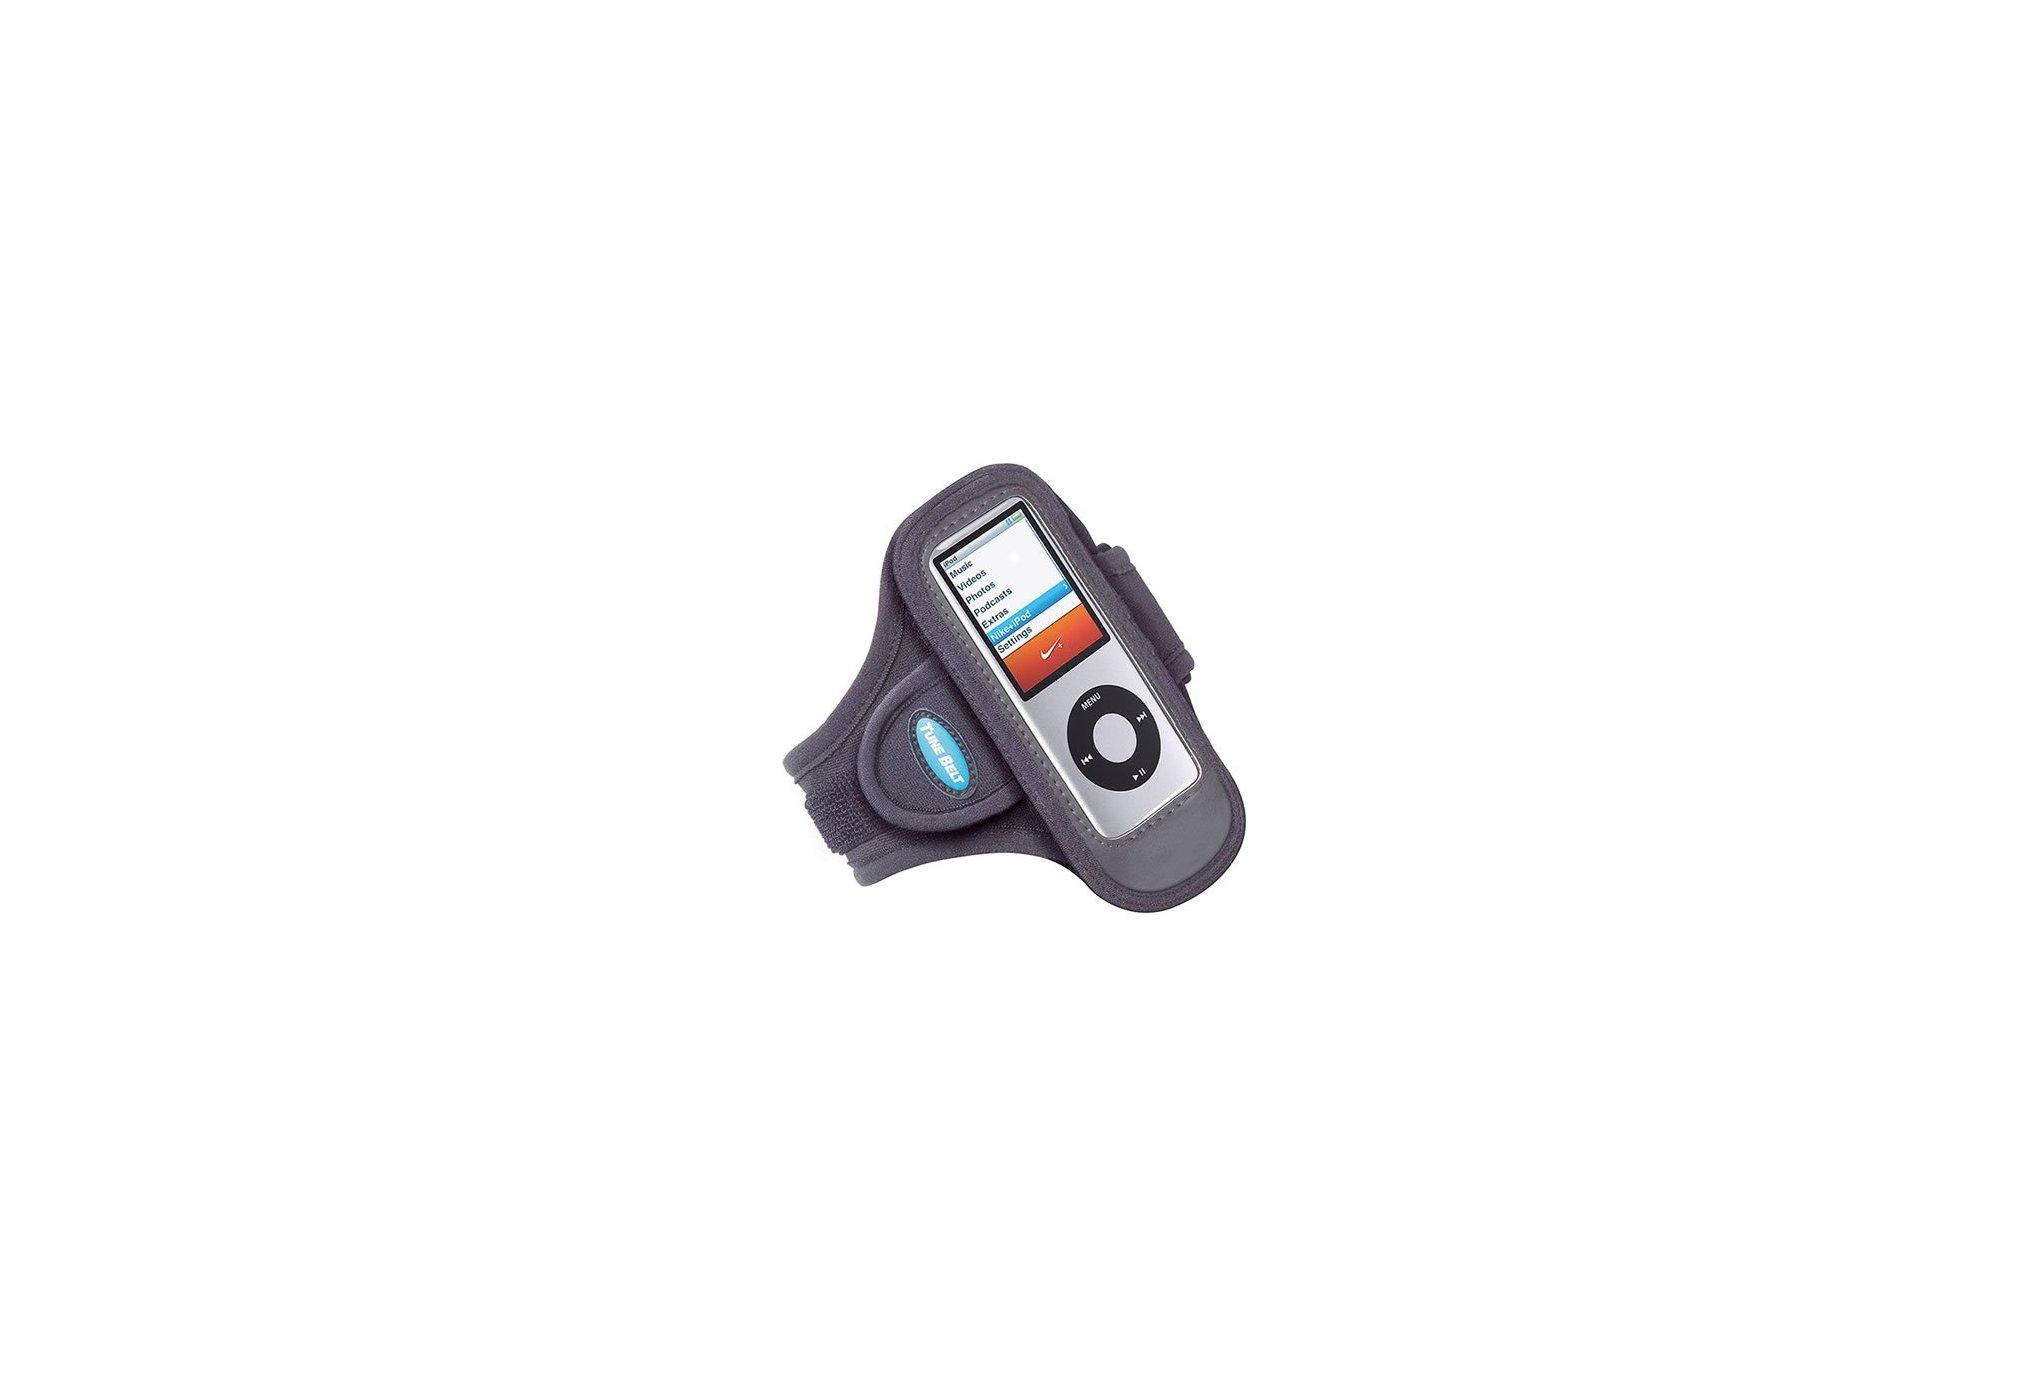 Tune Belt Brassard AB75+ Ipod Nano 5G Accessoires téléphone